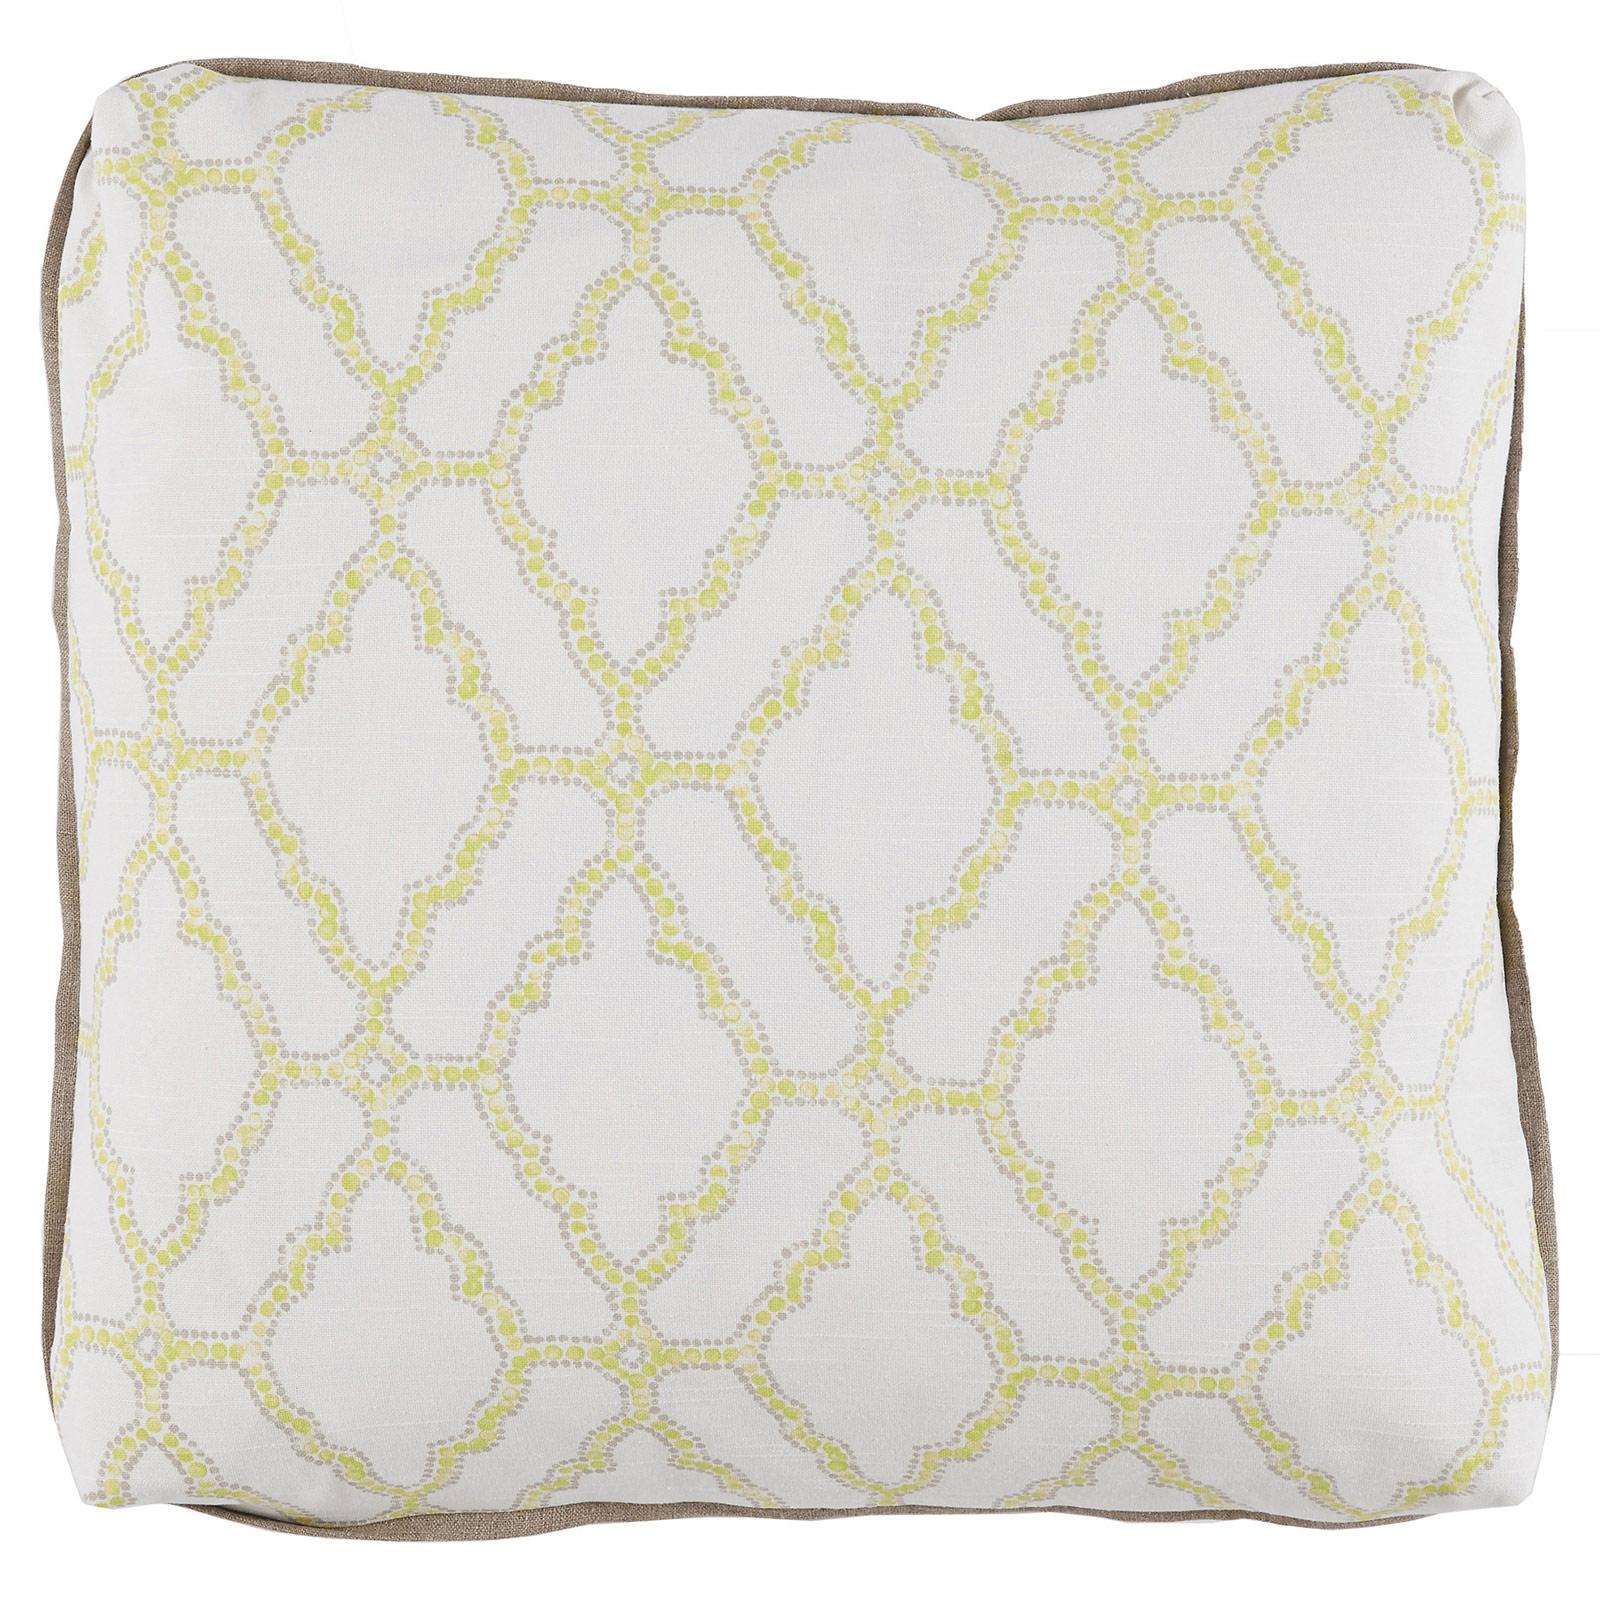 Esma Global Bazaar Turkish Medallion Yellow Linen Pillow- 24x24